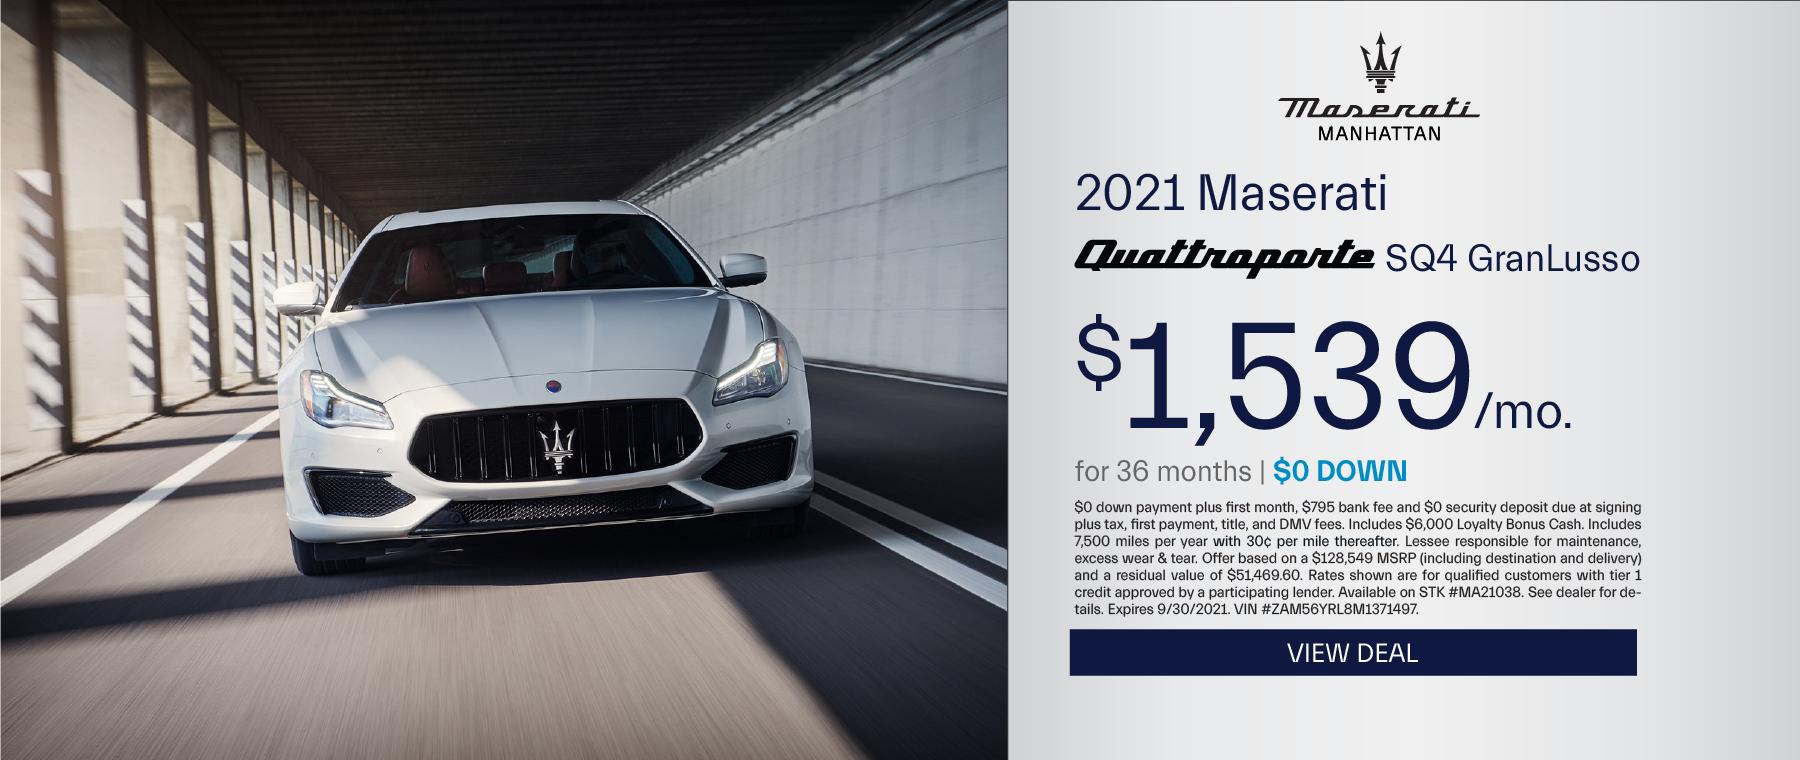 Maserati of Manhattan – 2020 Quattroporte – September 2021 – update